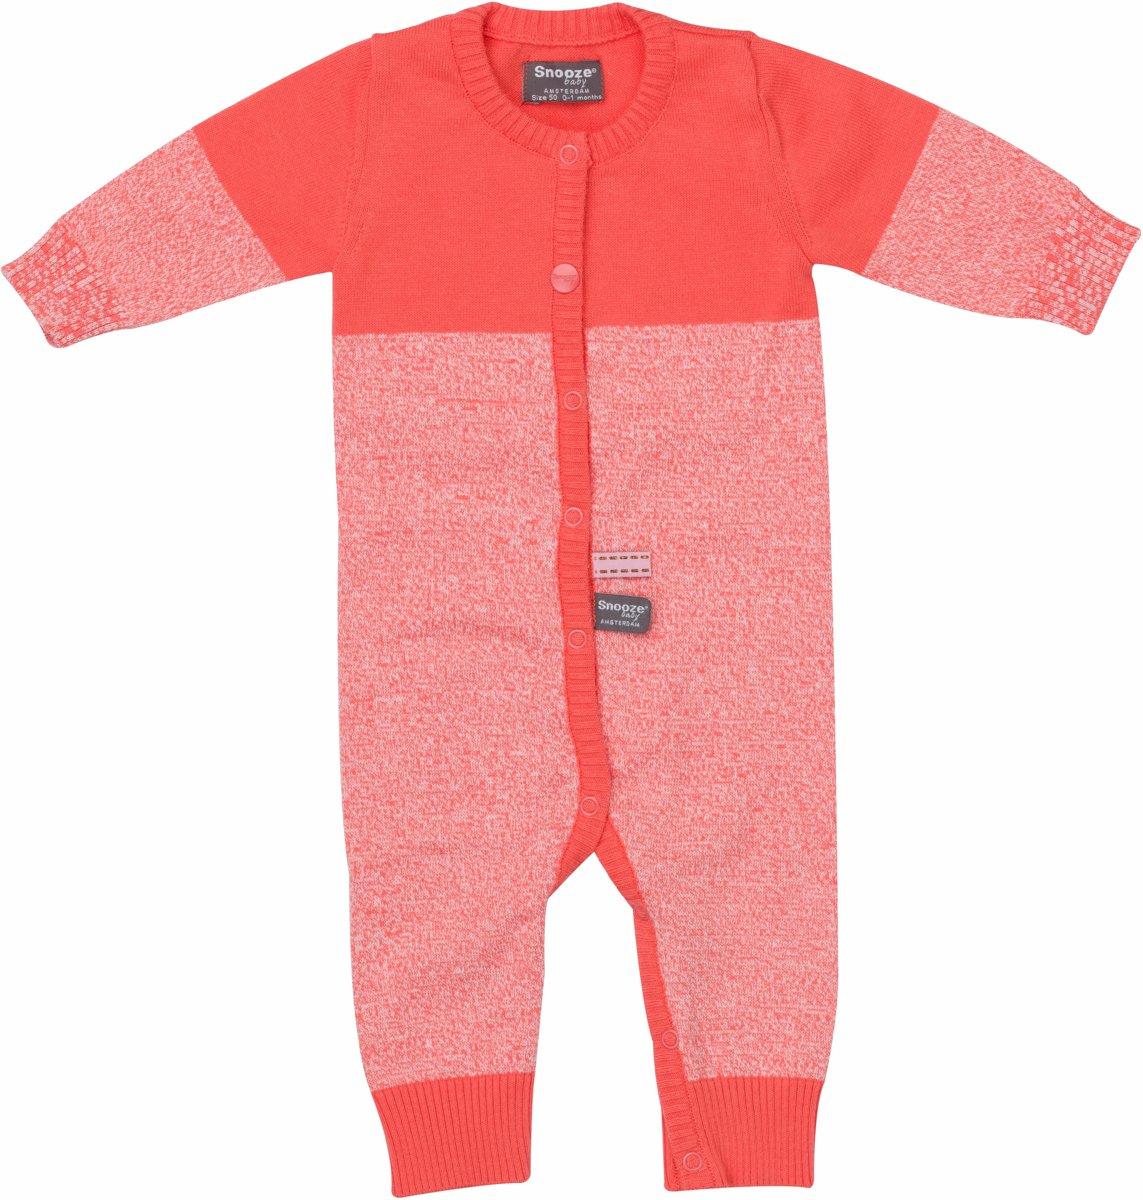 Maat 50 Babykleding.Snoozebaby Unisex Boxpakje Suit Knitted Coral Sunset Maat 50